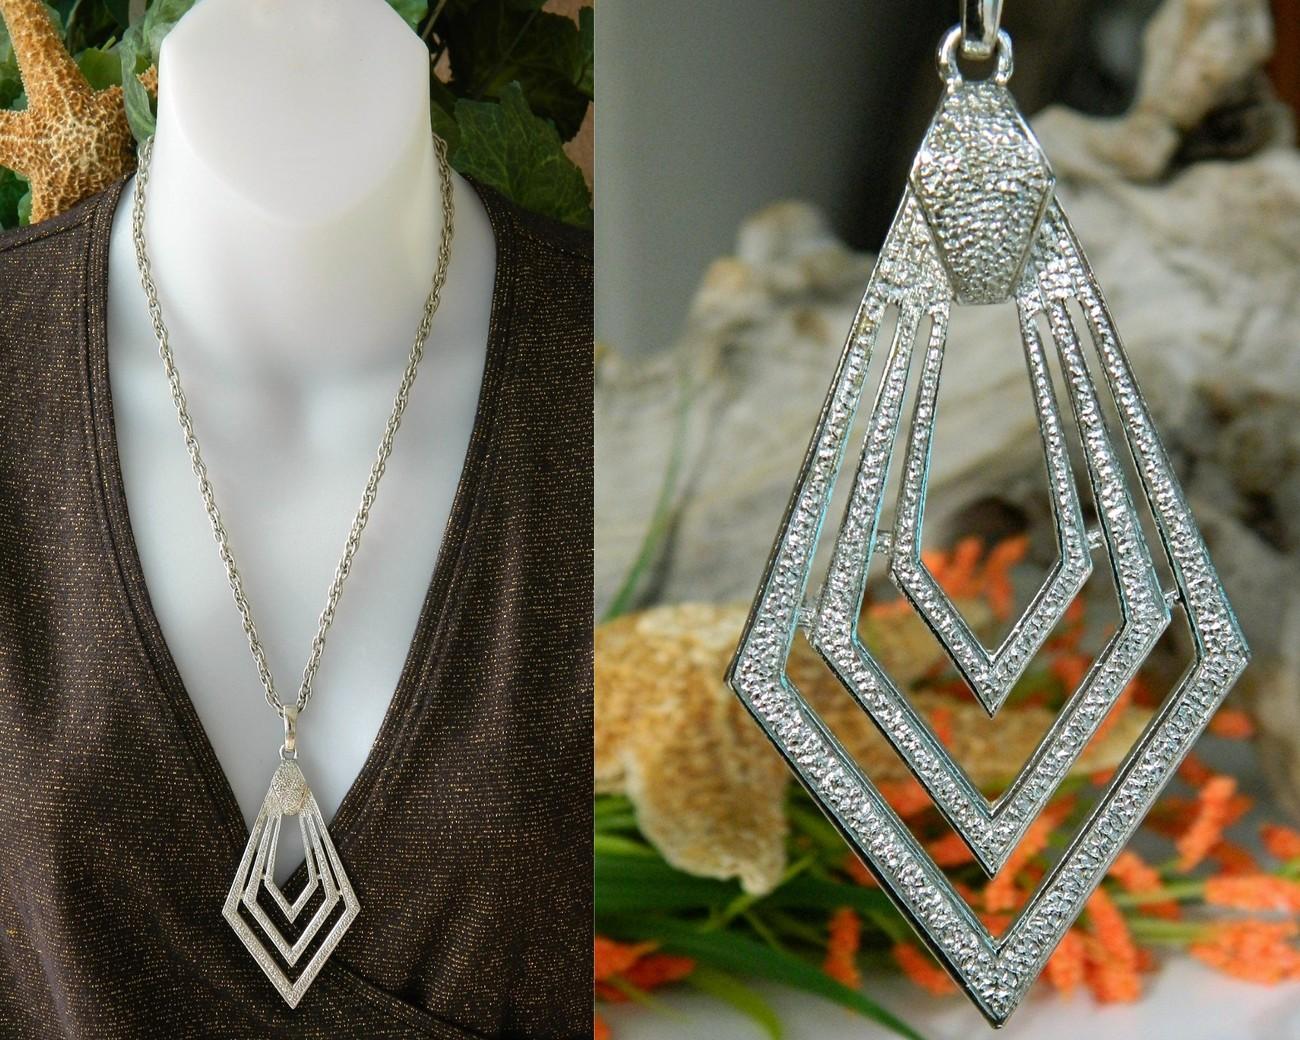 Vintage geometric diamond shaped pendant necklace concentric